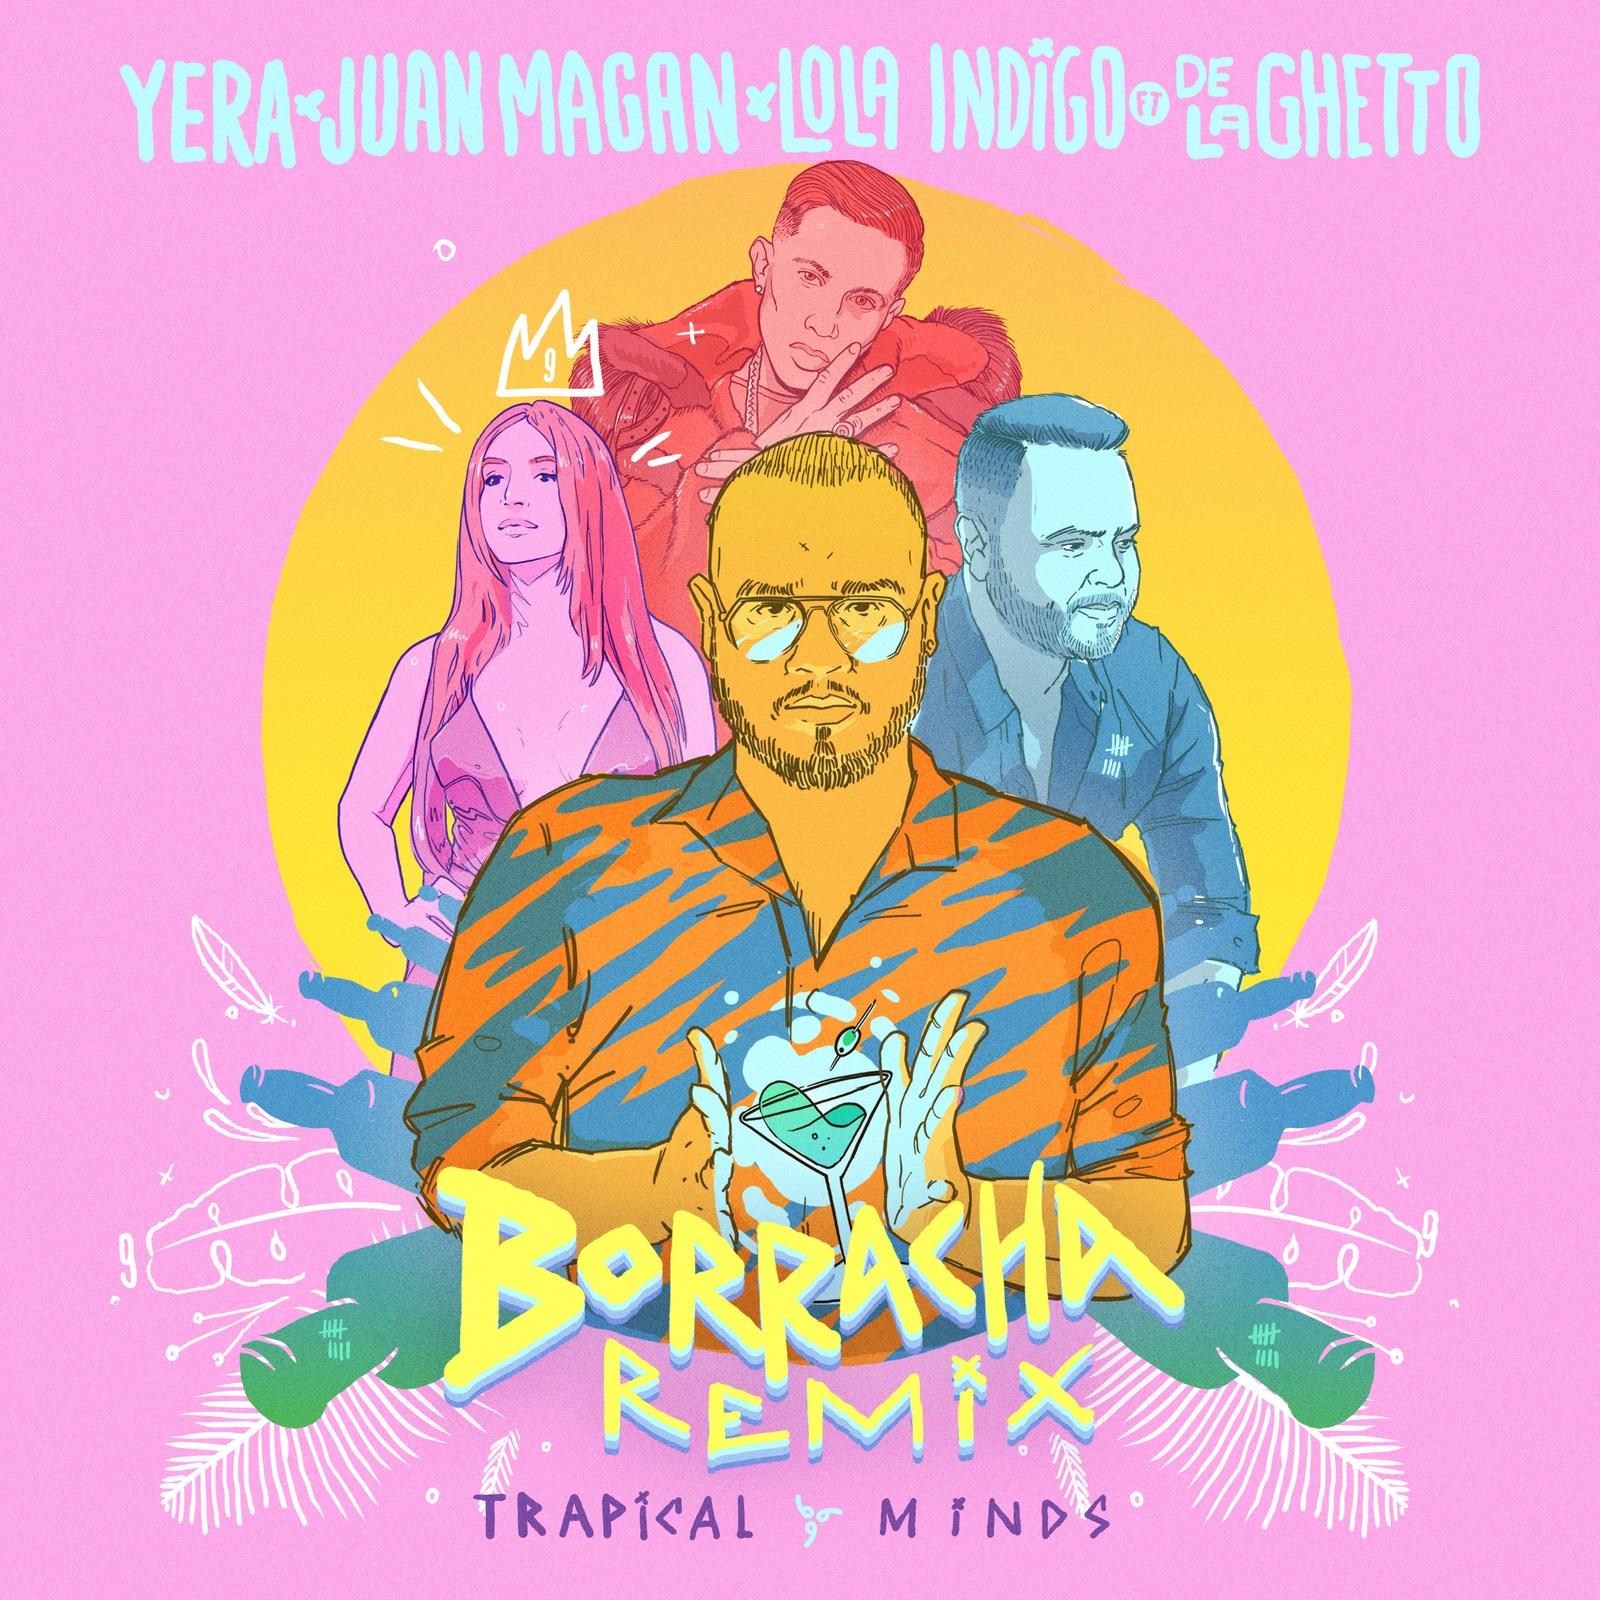 Borracha (Remix)